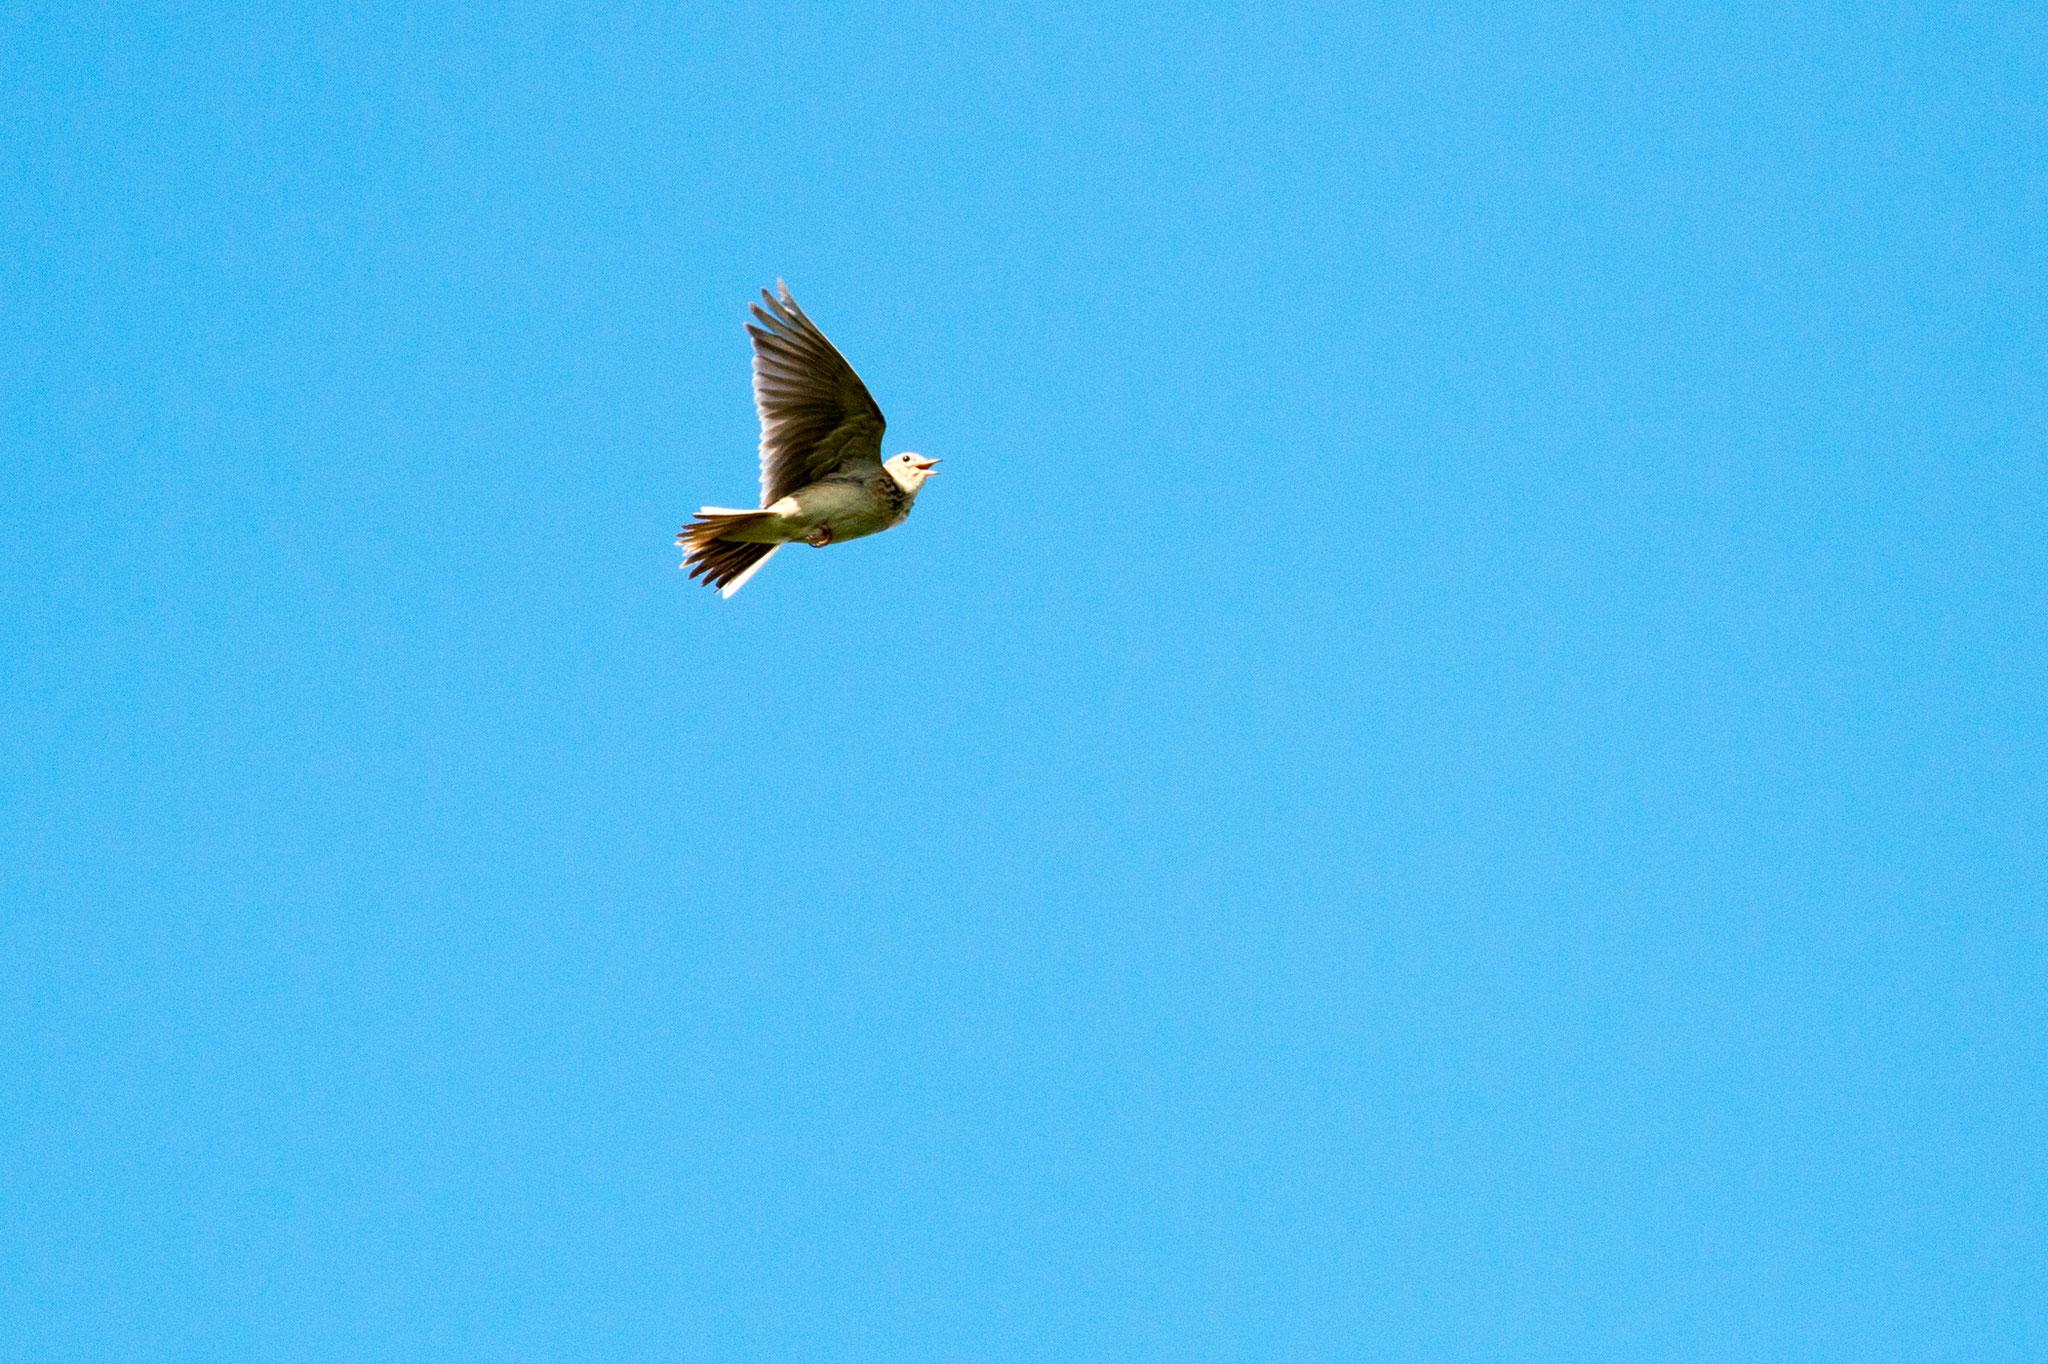 Singende Feldlerche (Alauda arvensis) im Flug